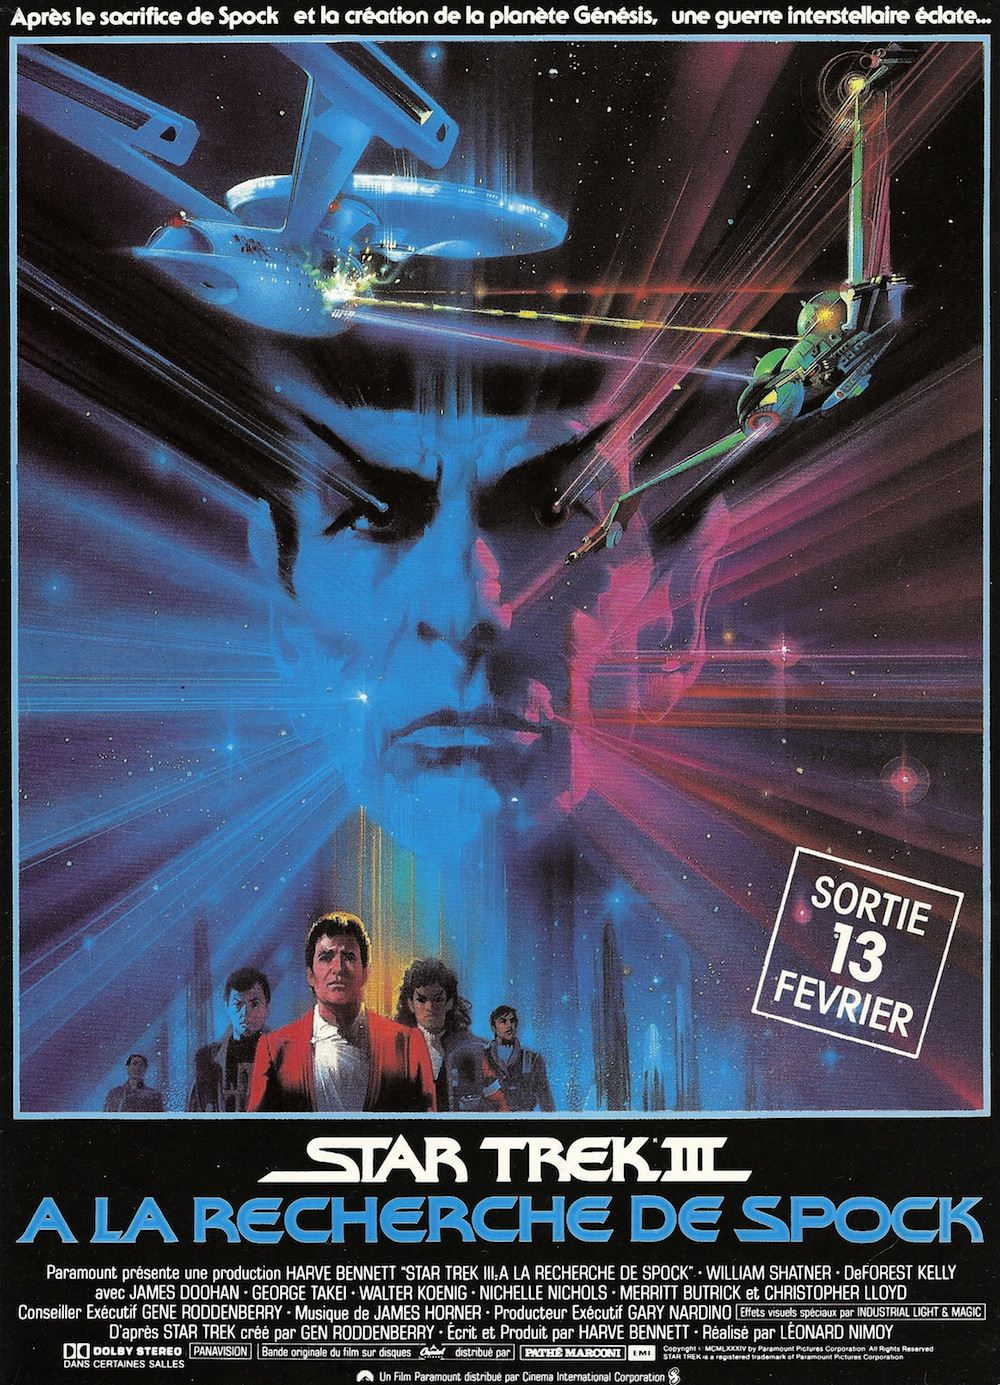 Star trek 3 a la recherche de spock leonard nimoy